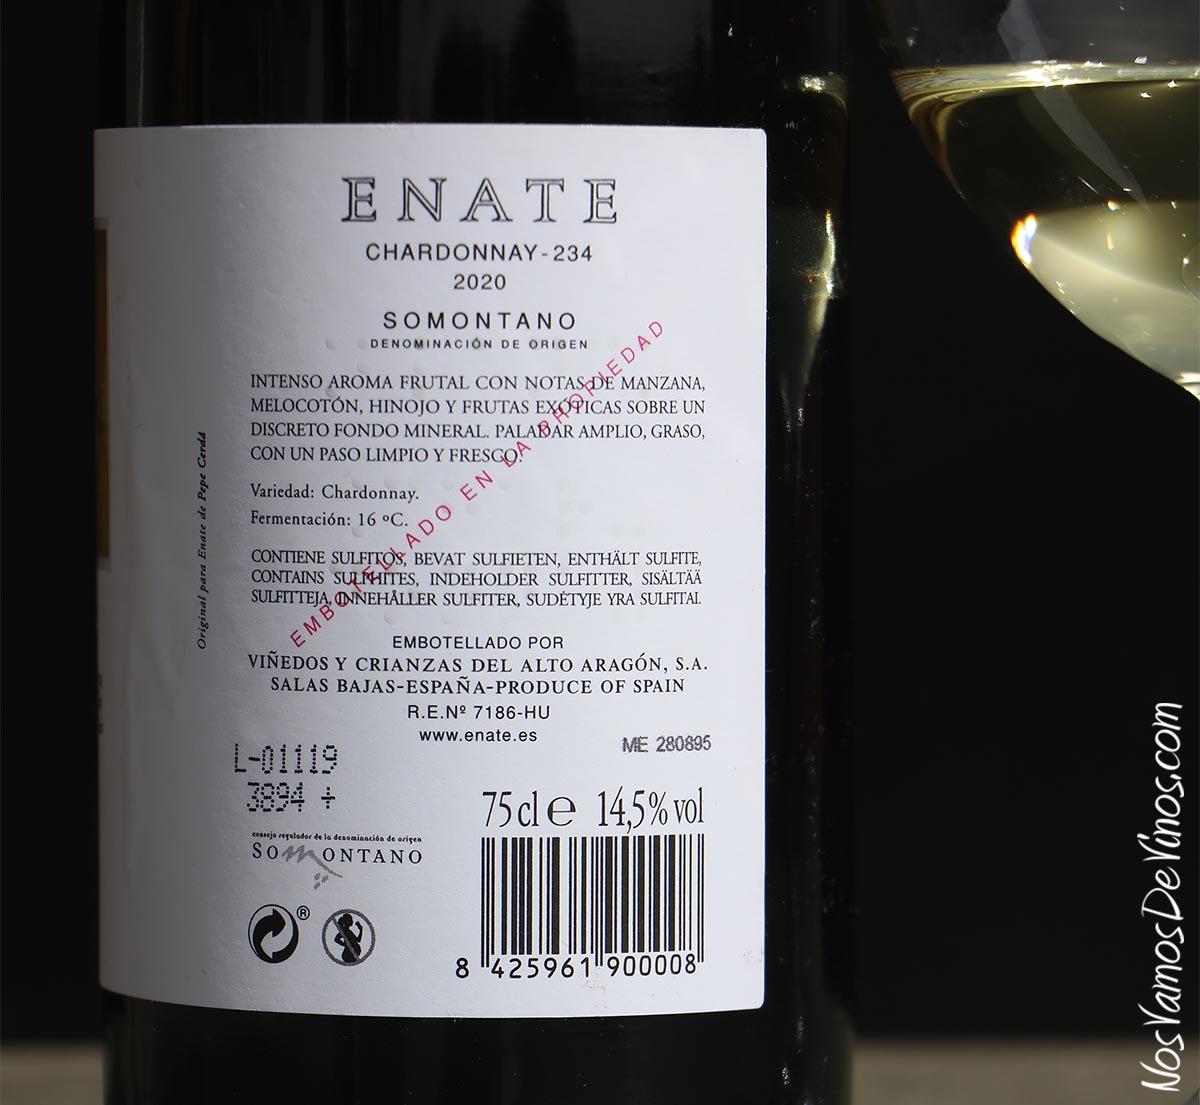 Enate Chardonnay-234 2020 Trasera